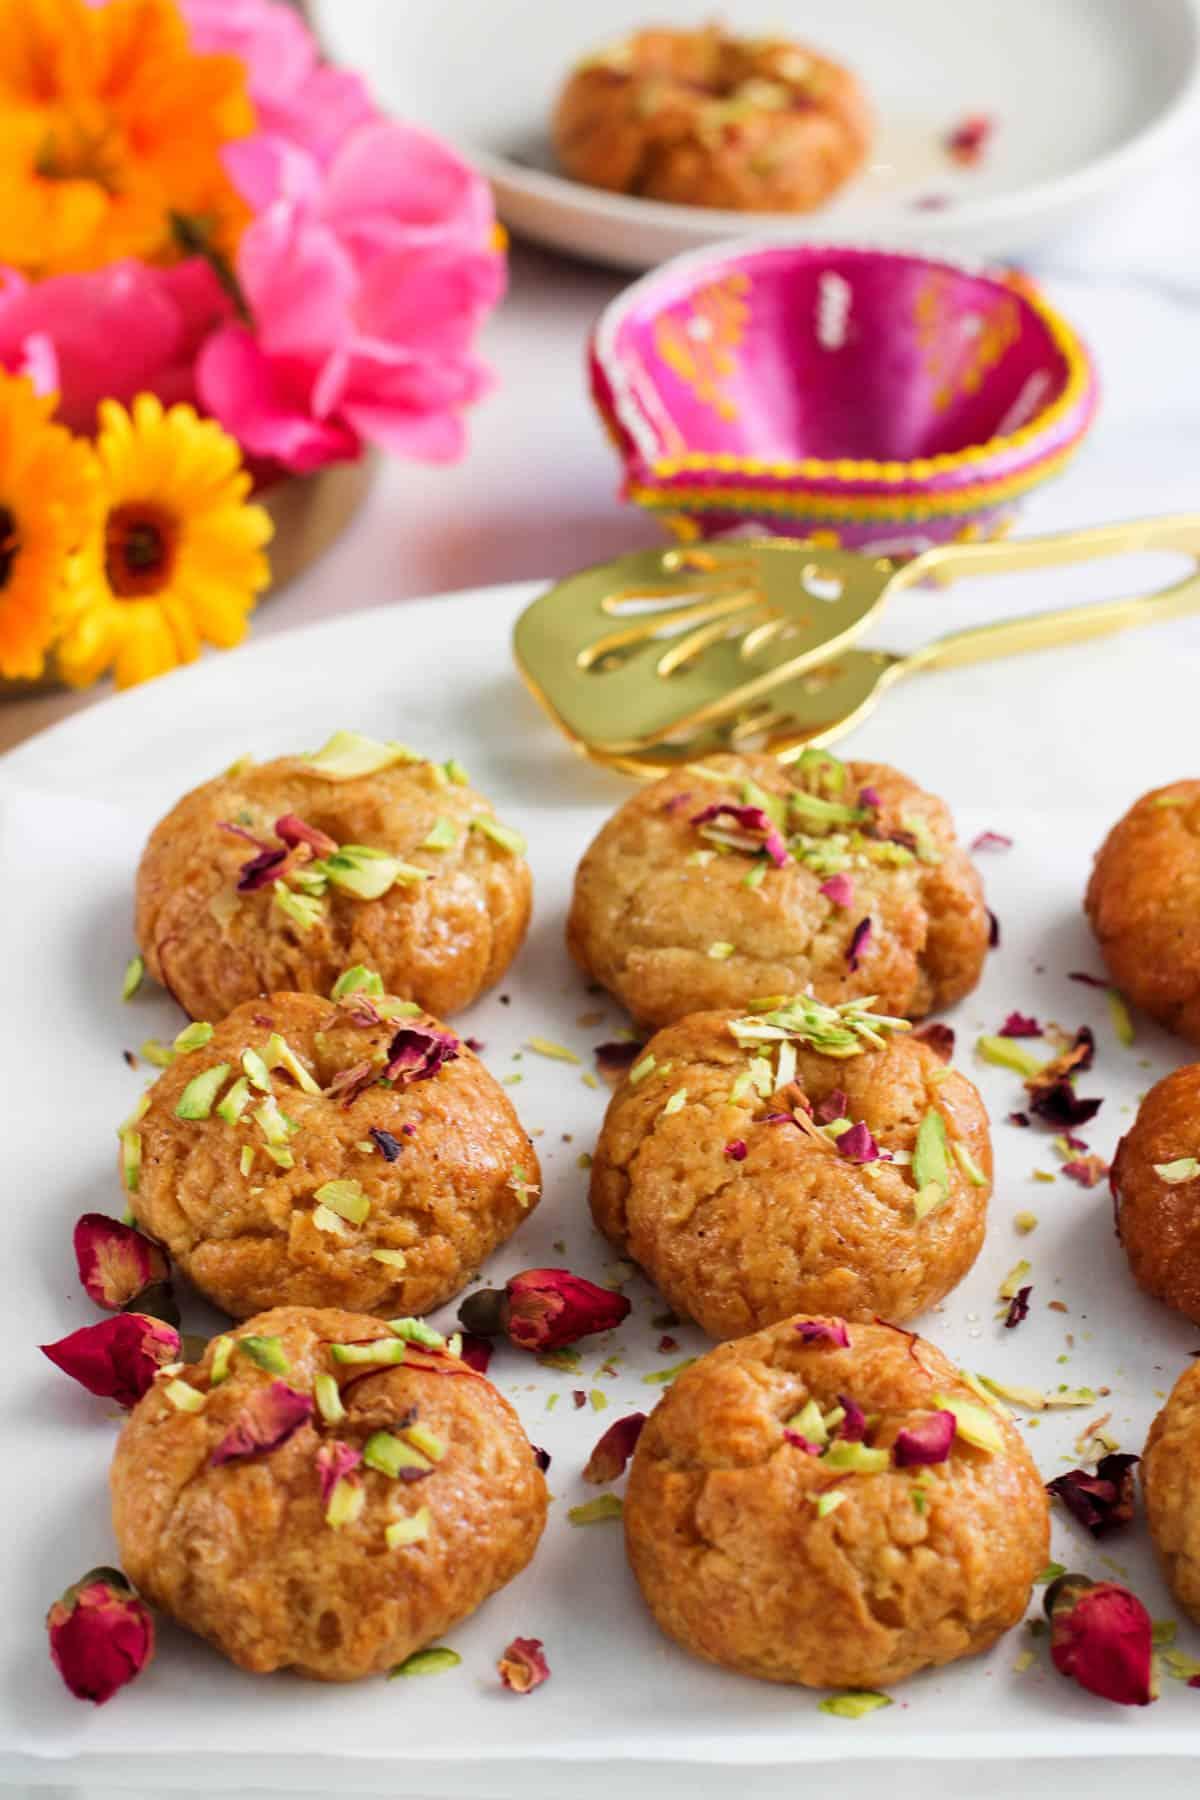 Balushahi garnished with pistachios and rose petals